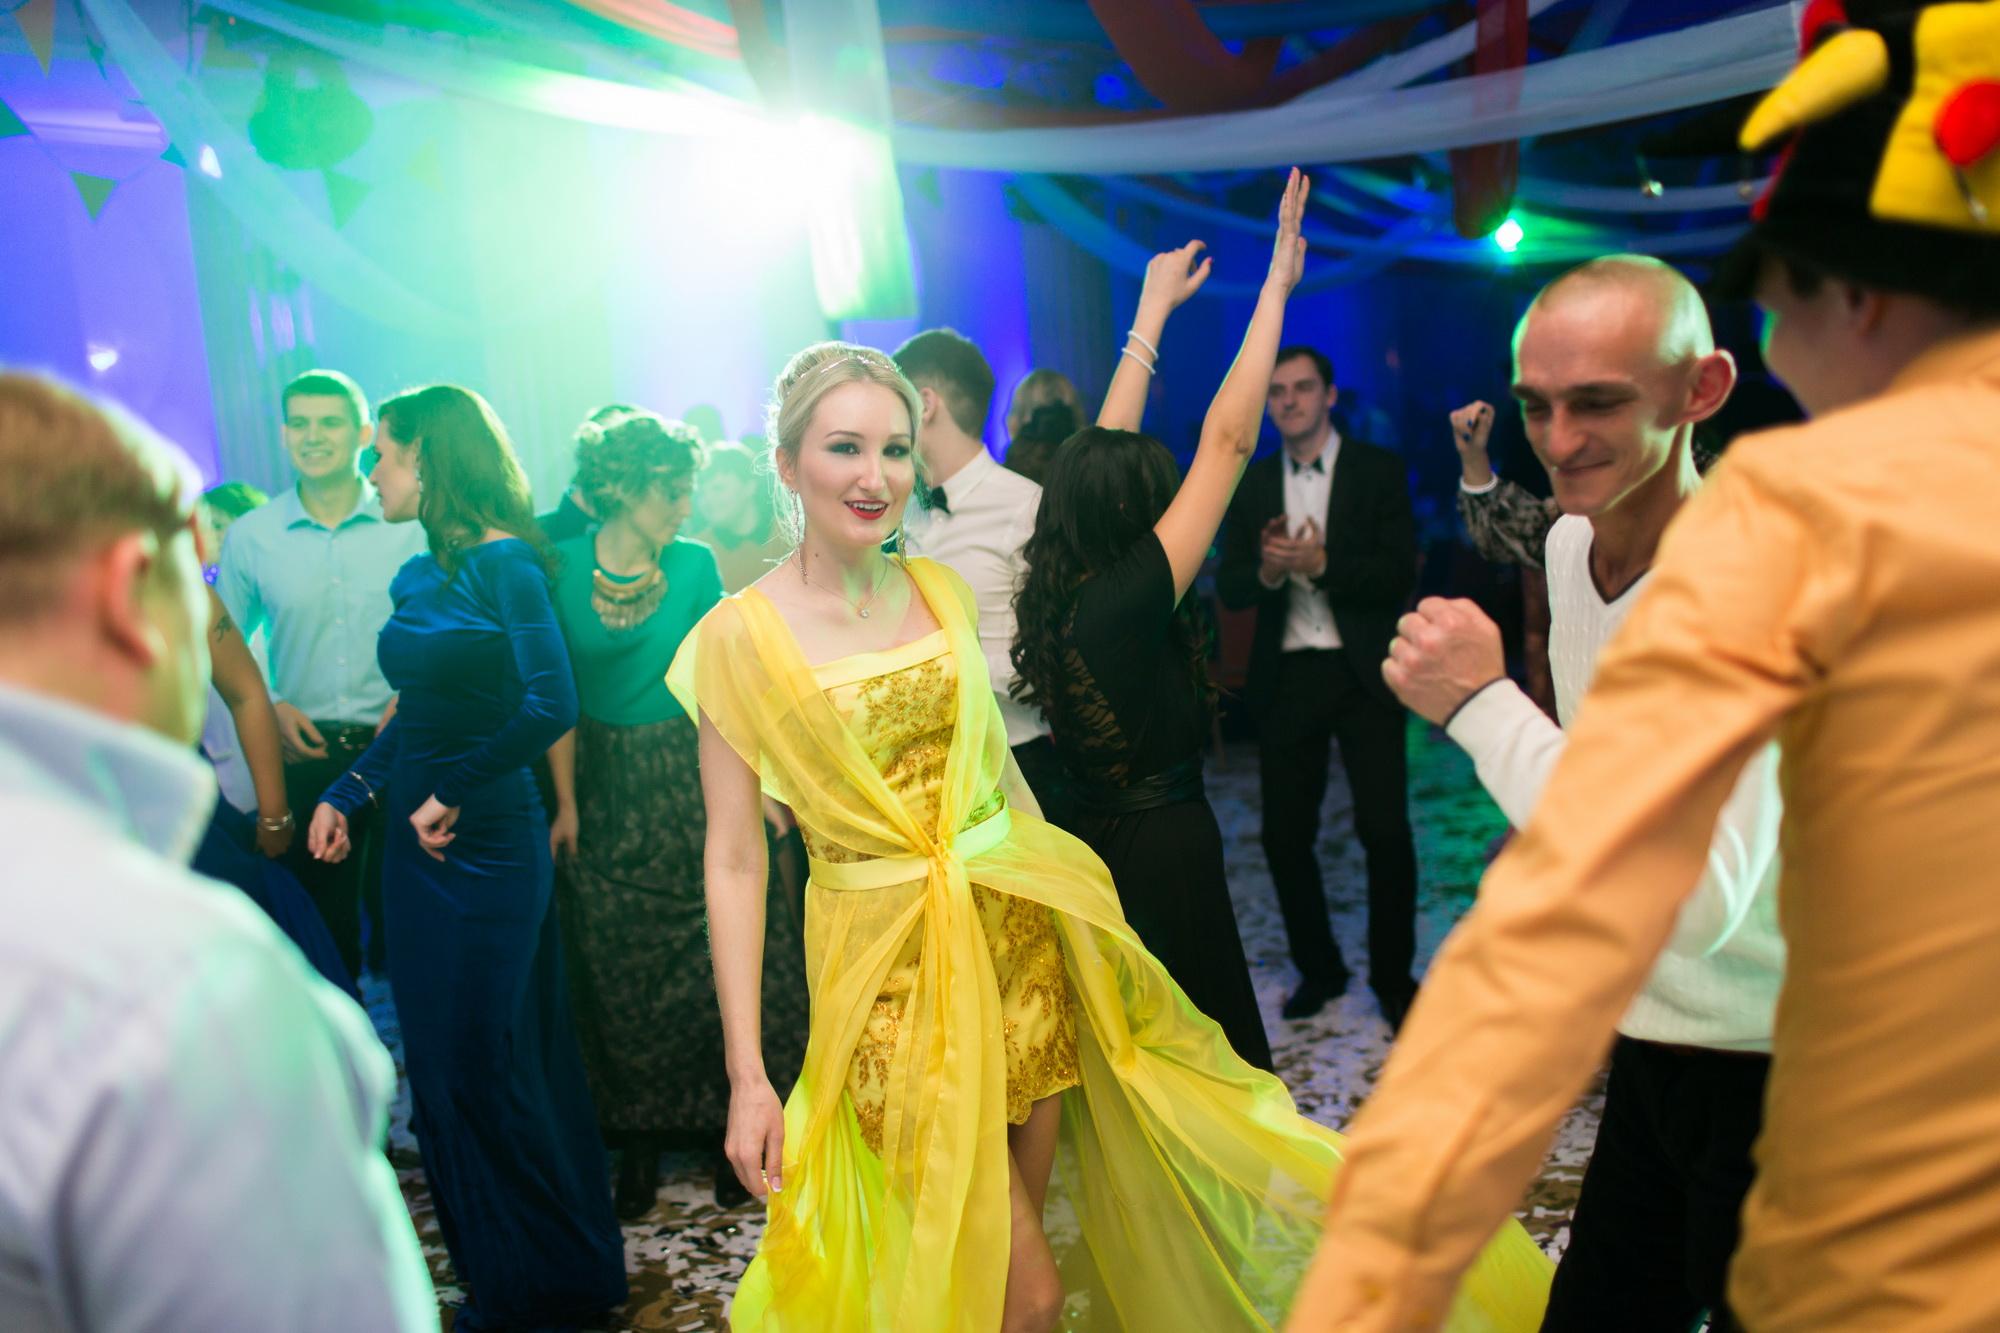 Лучший корпоратив в Одессе от Скоро Свадьба. Гостиница Бристоль.